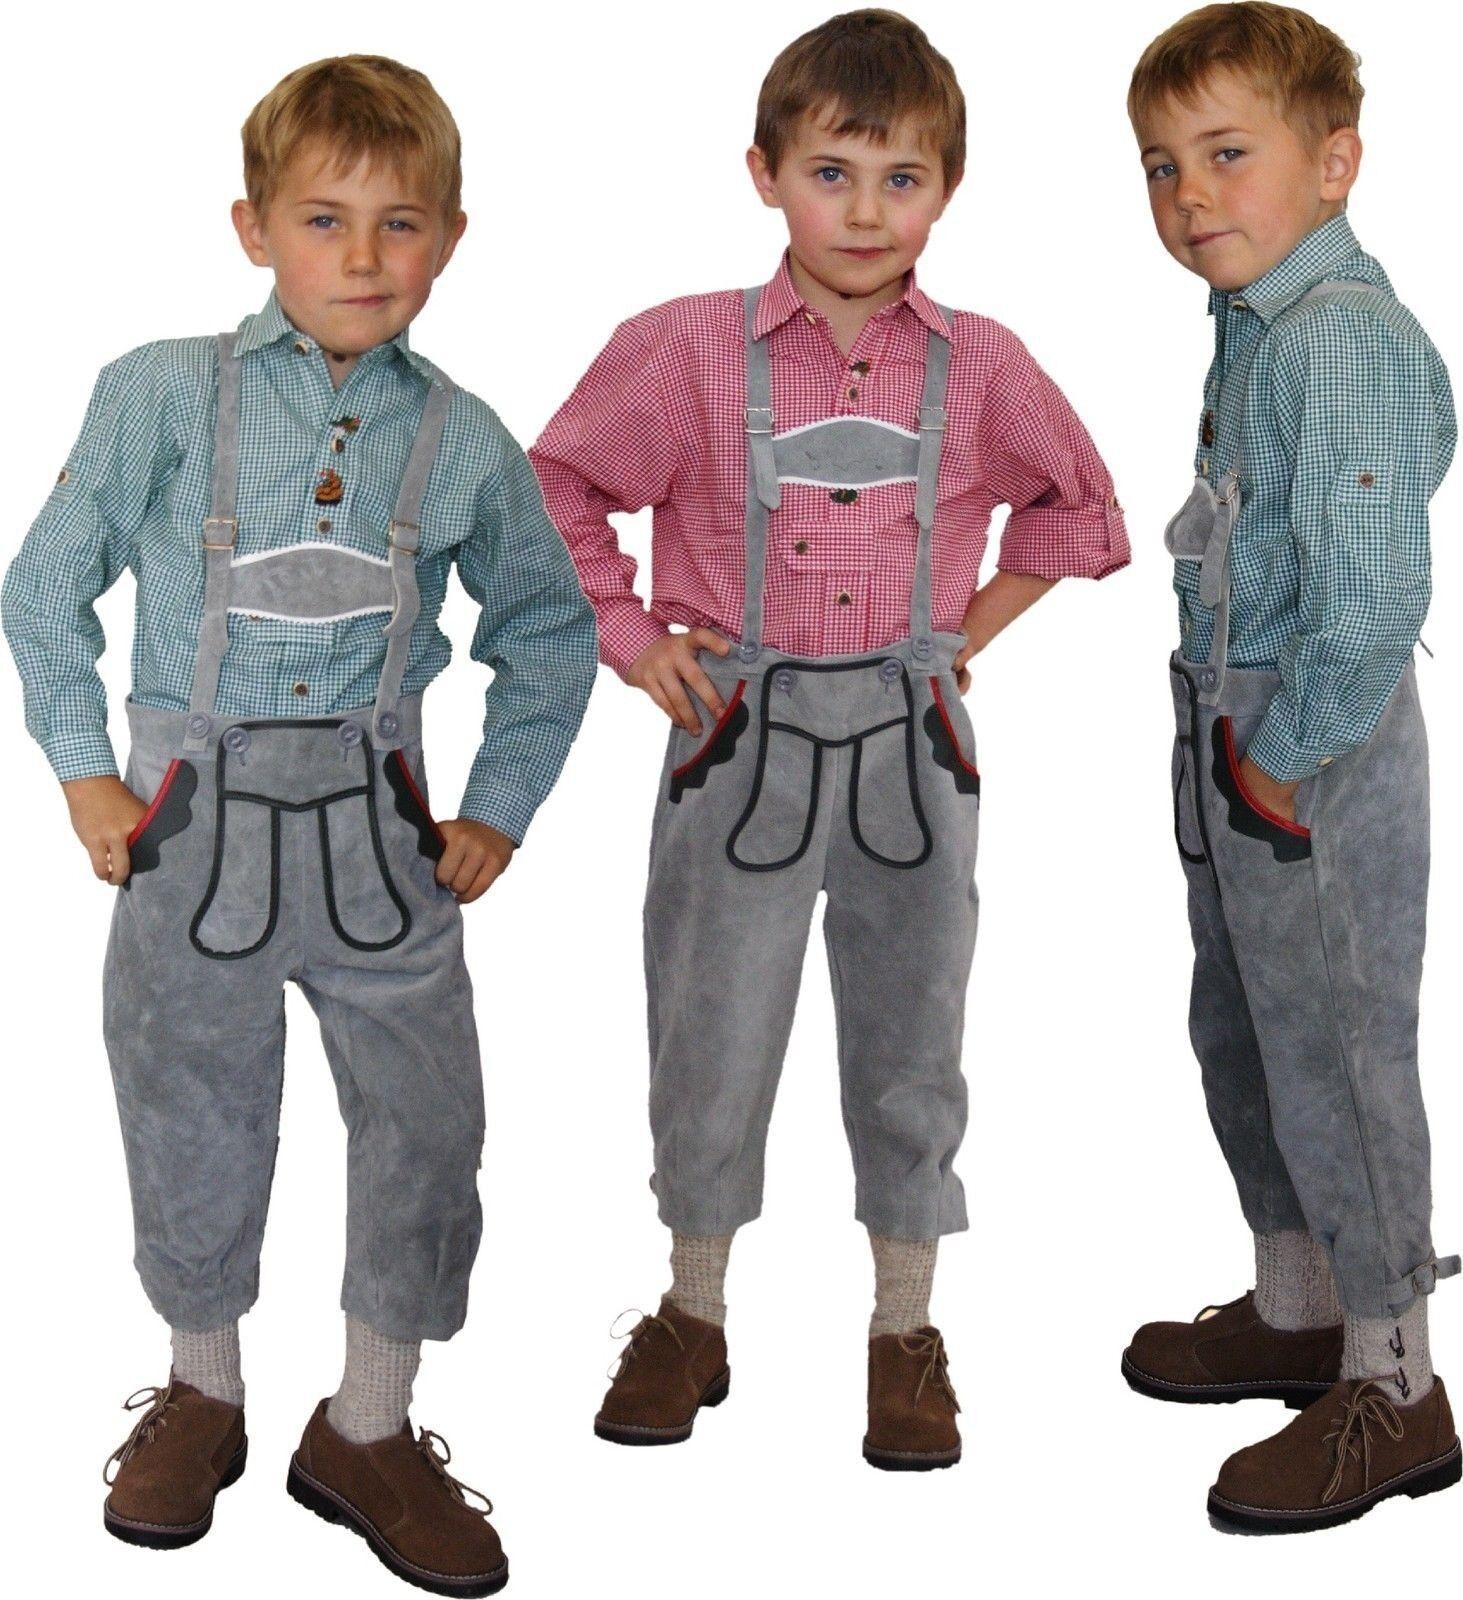 Kniebundlederhose Lederhose + Träger Trachten Trachtenlederhose für Kinder grey